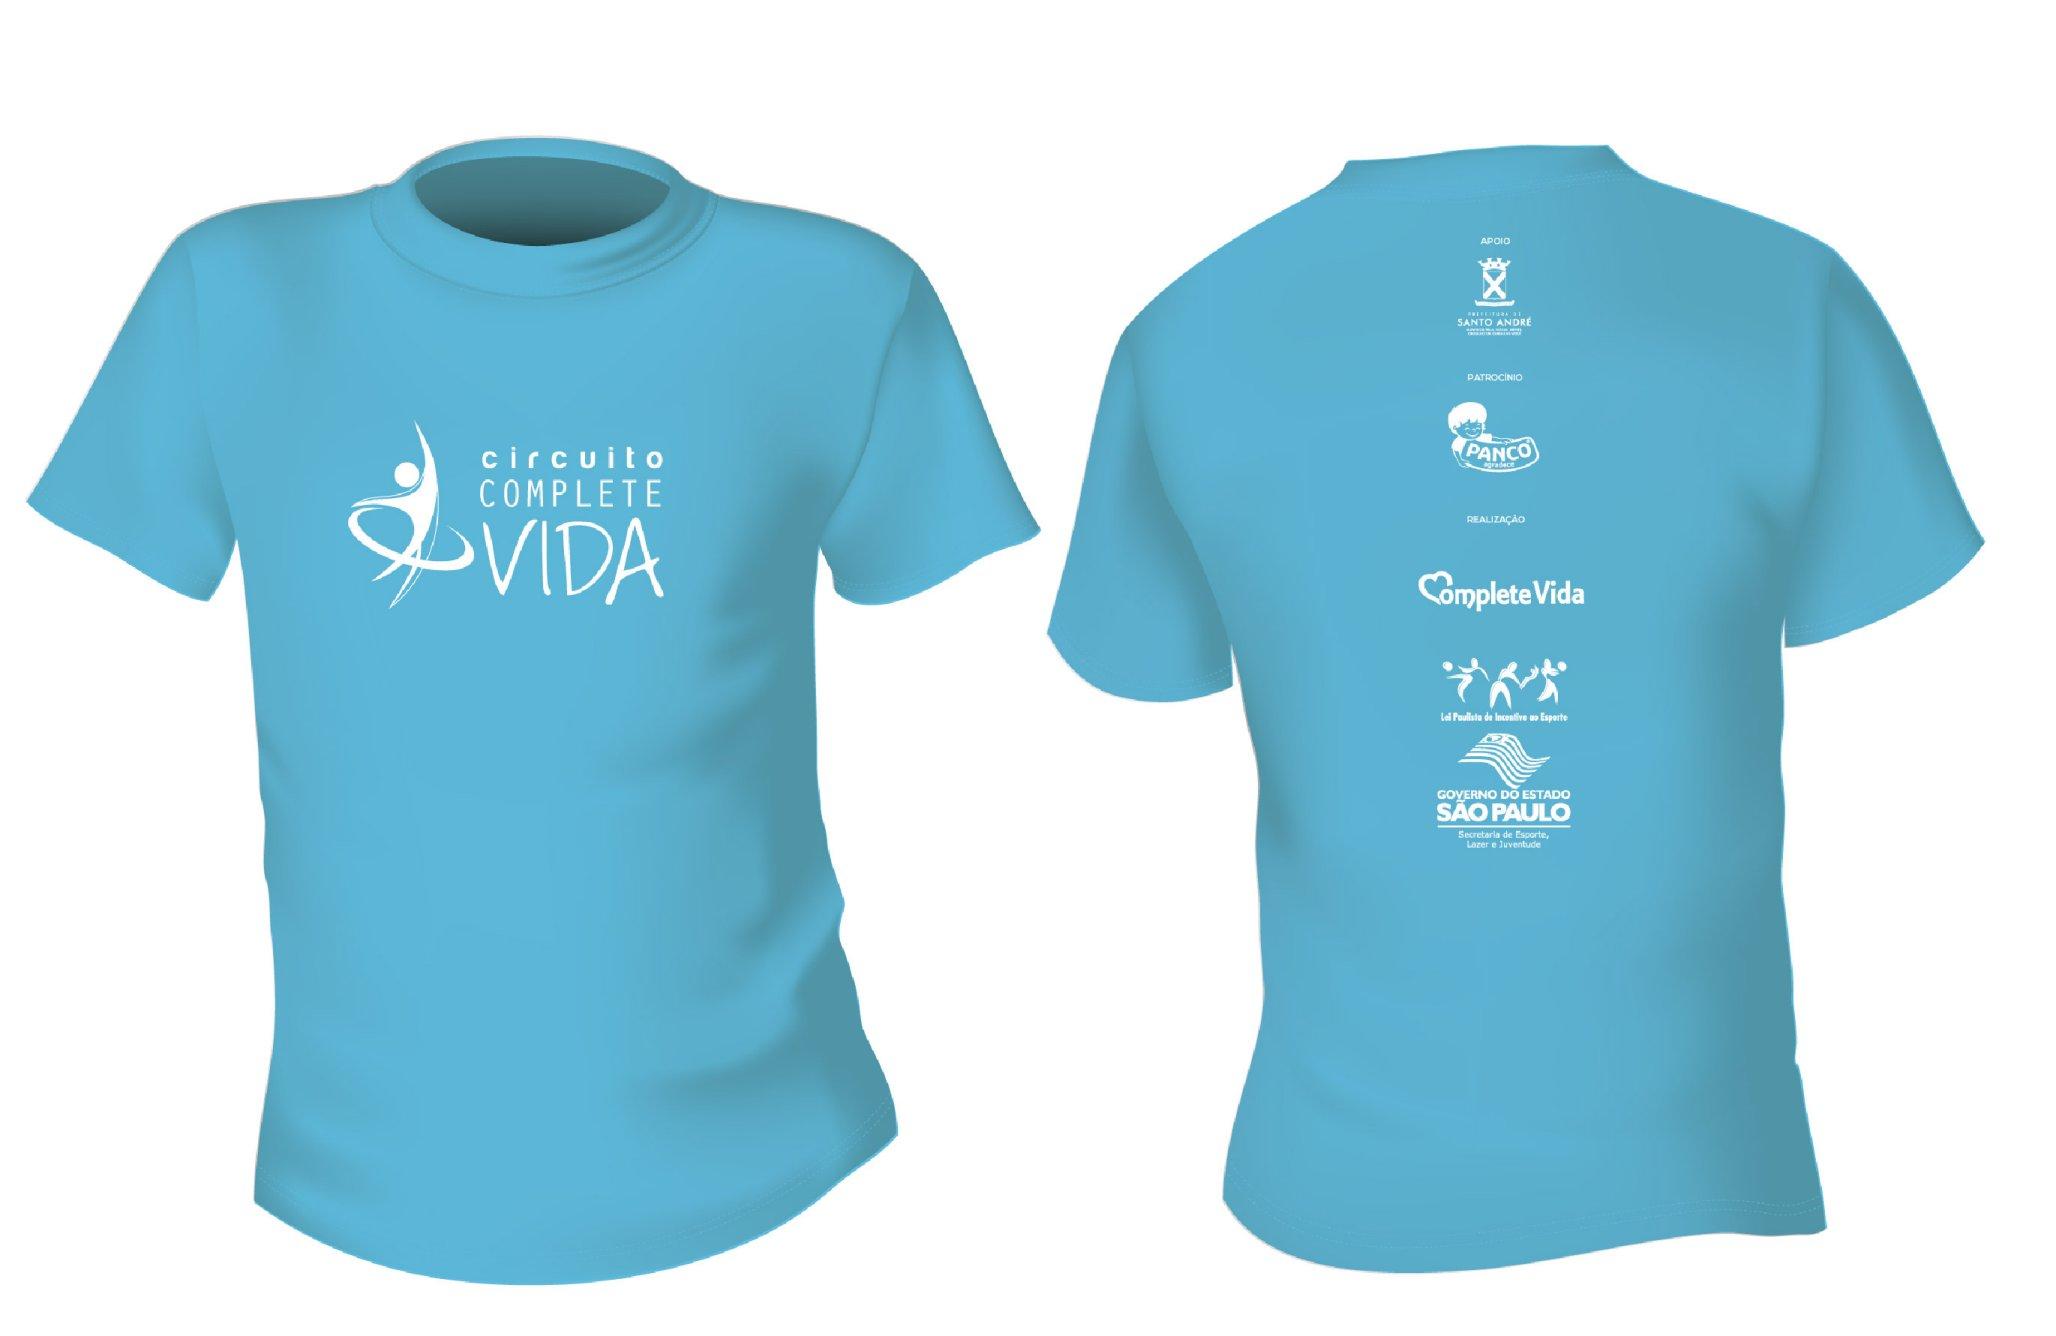 Camisa Panco AZUL Janeiro Santo André-14